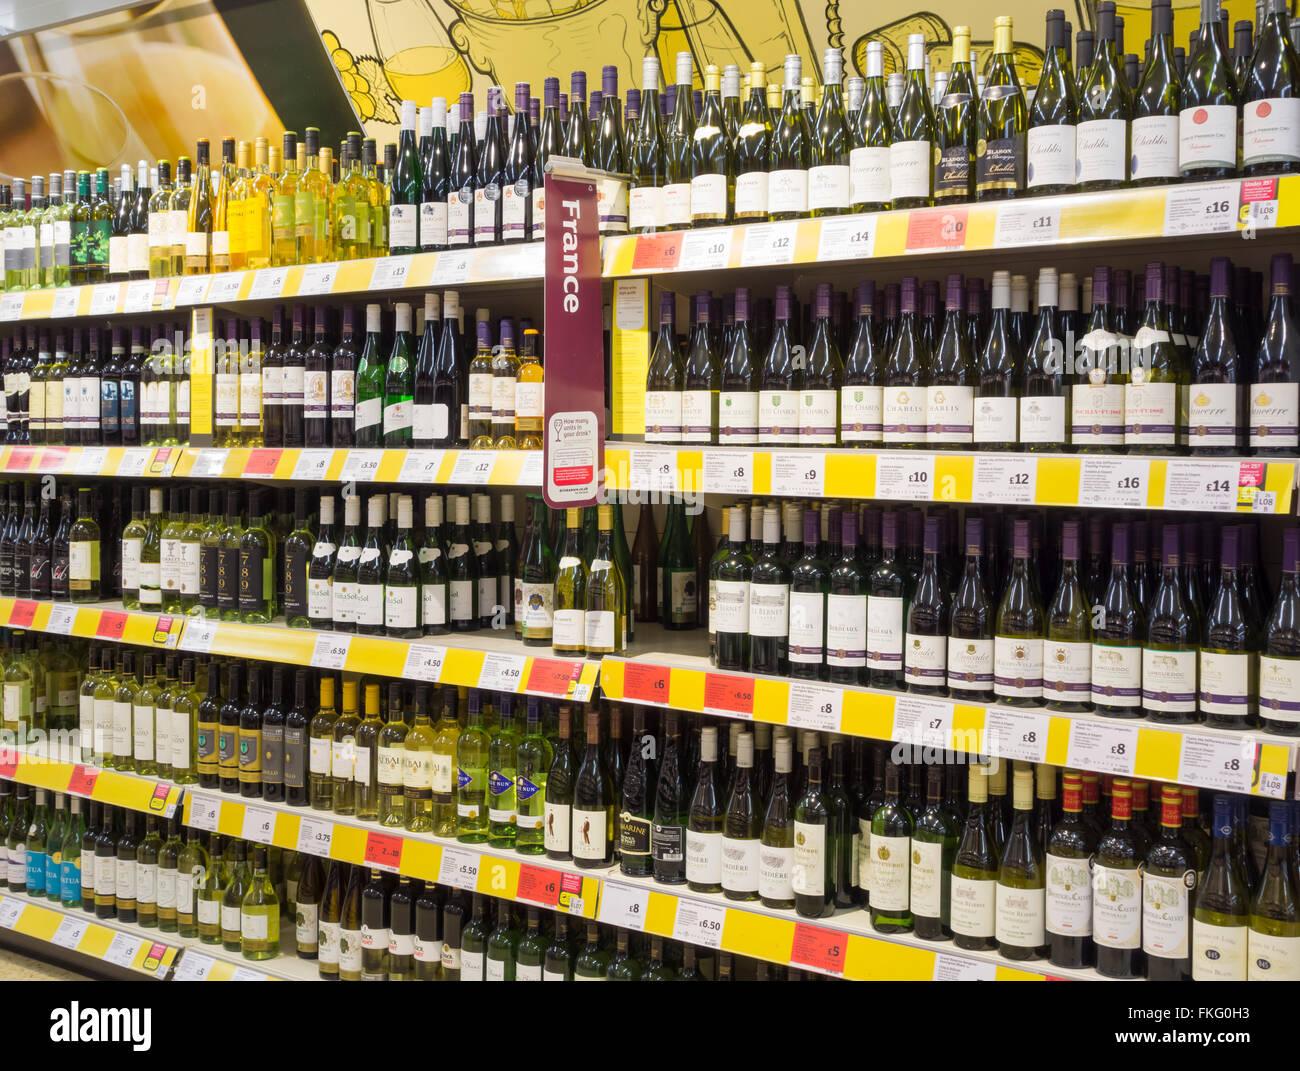 White apron sainsburys - White Wine Display In Sainsburys Supermarket Uk Stock Image